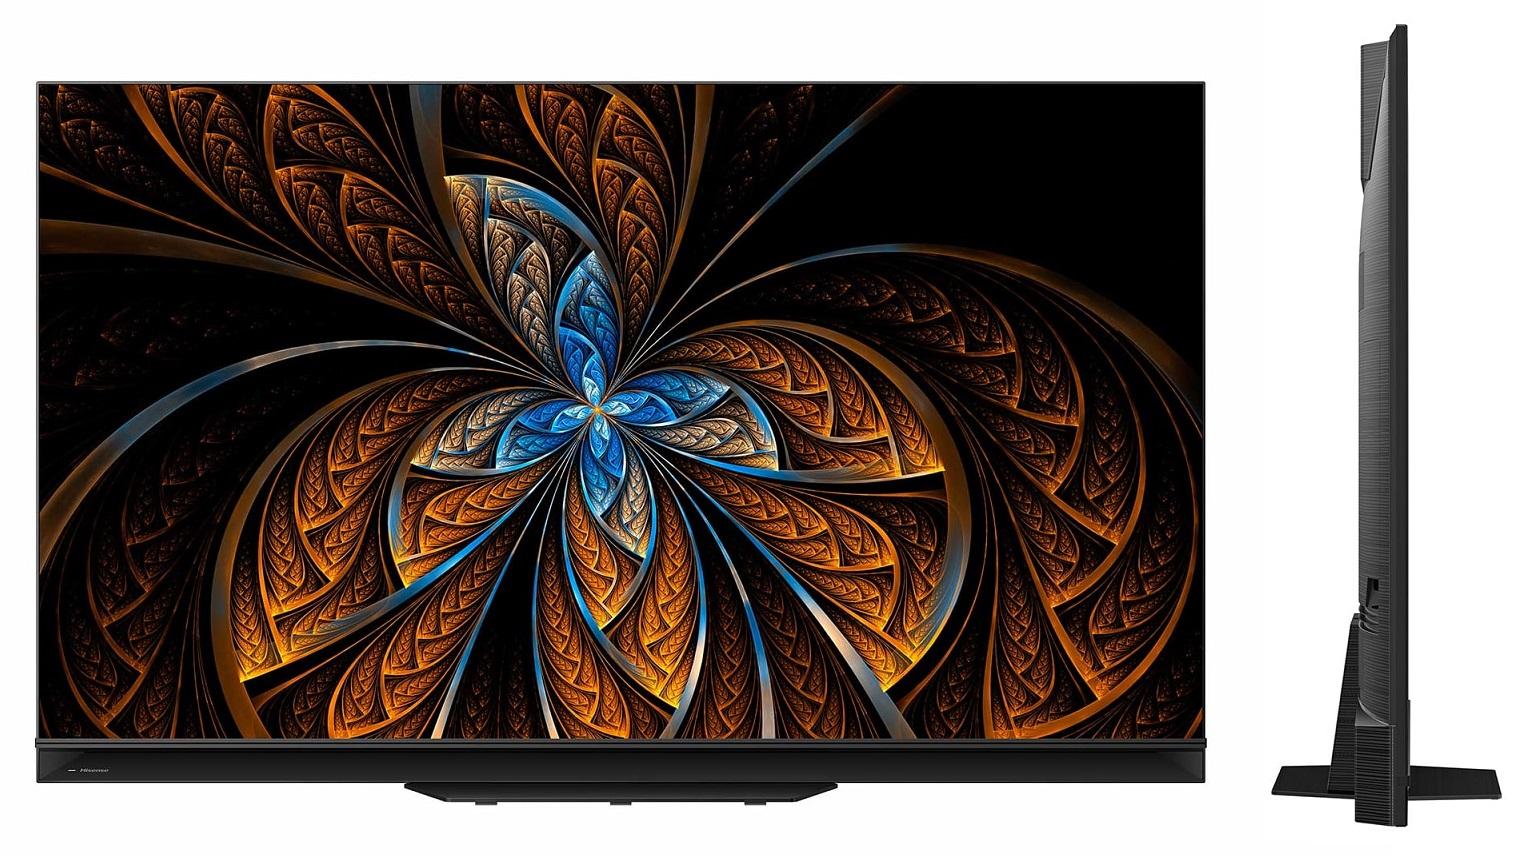 Hisense U9GQ miniLED LCD TV